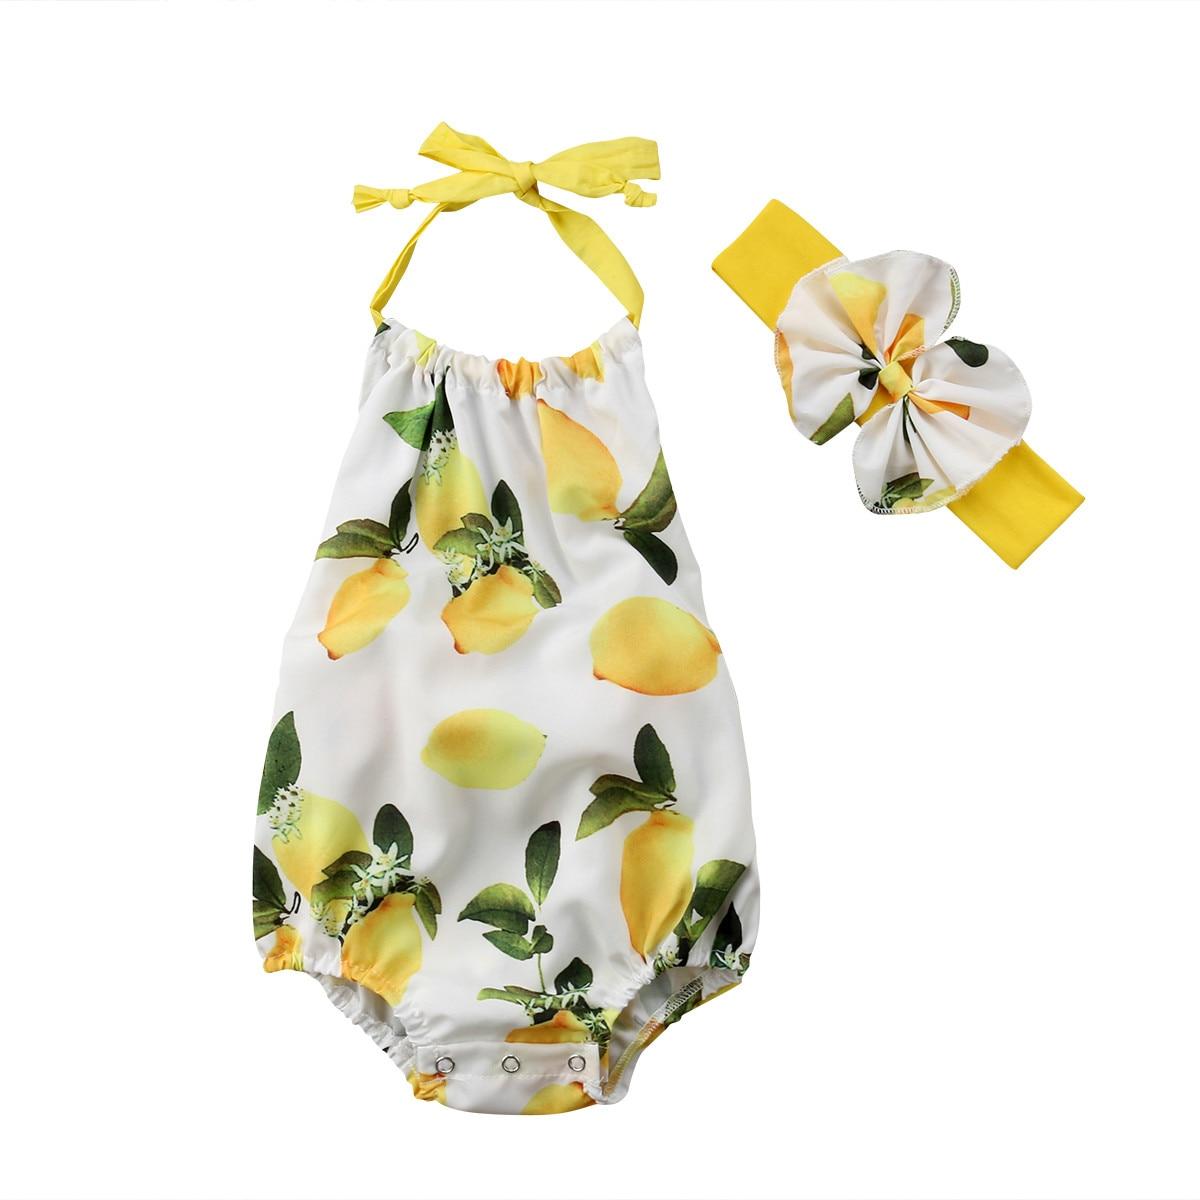 0-24 M Leuke Pasgeboren Baby Meisje Mouwloze Backless Strik Citroen Band Romper Jumpsuit Hoofdband 2 Stuks Outfits Zomer Kleding Een Onmisbare Soevereine Remedie Voor Thuis